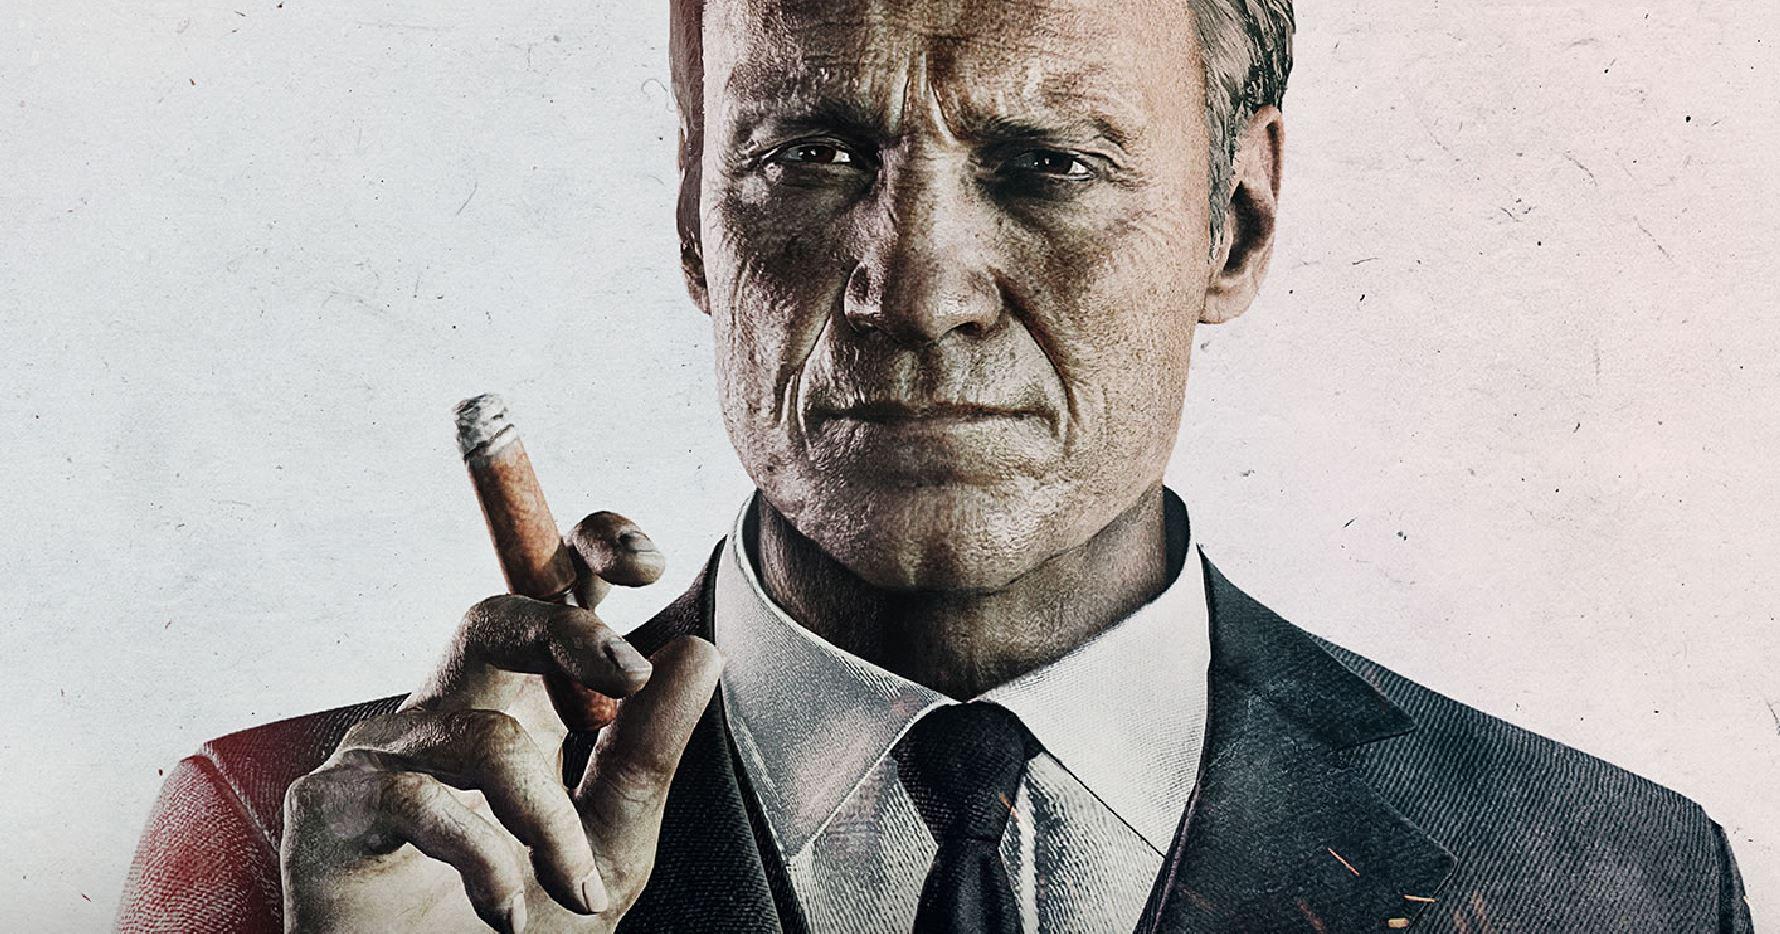 Weekend deals: Mafia III 24% off pre-load, FIFA 17, and $20 Sniper Elite III collector's edition screenshot